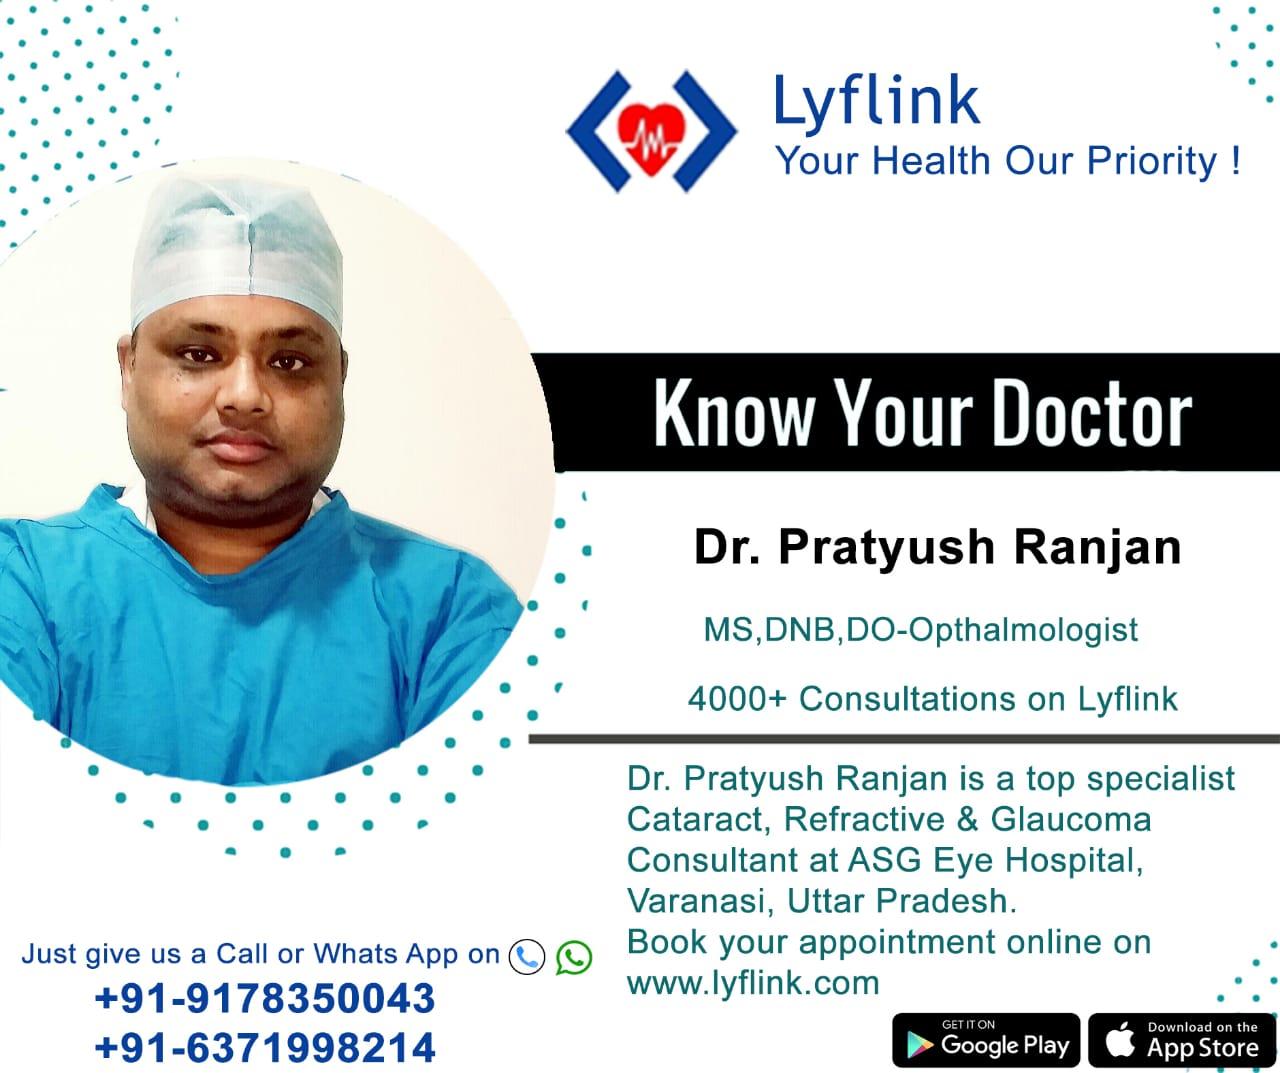 Dr. Pratyush Ranjan